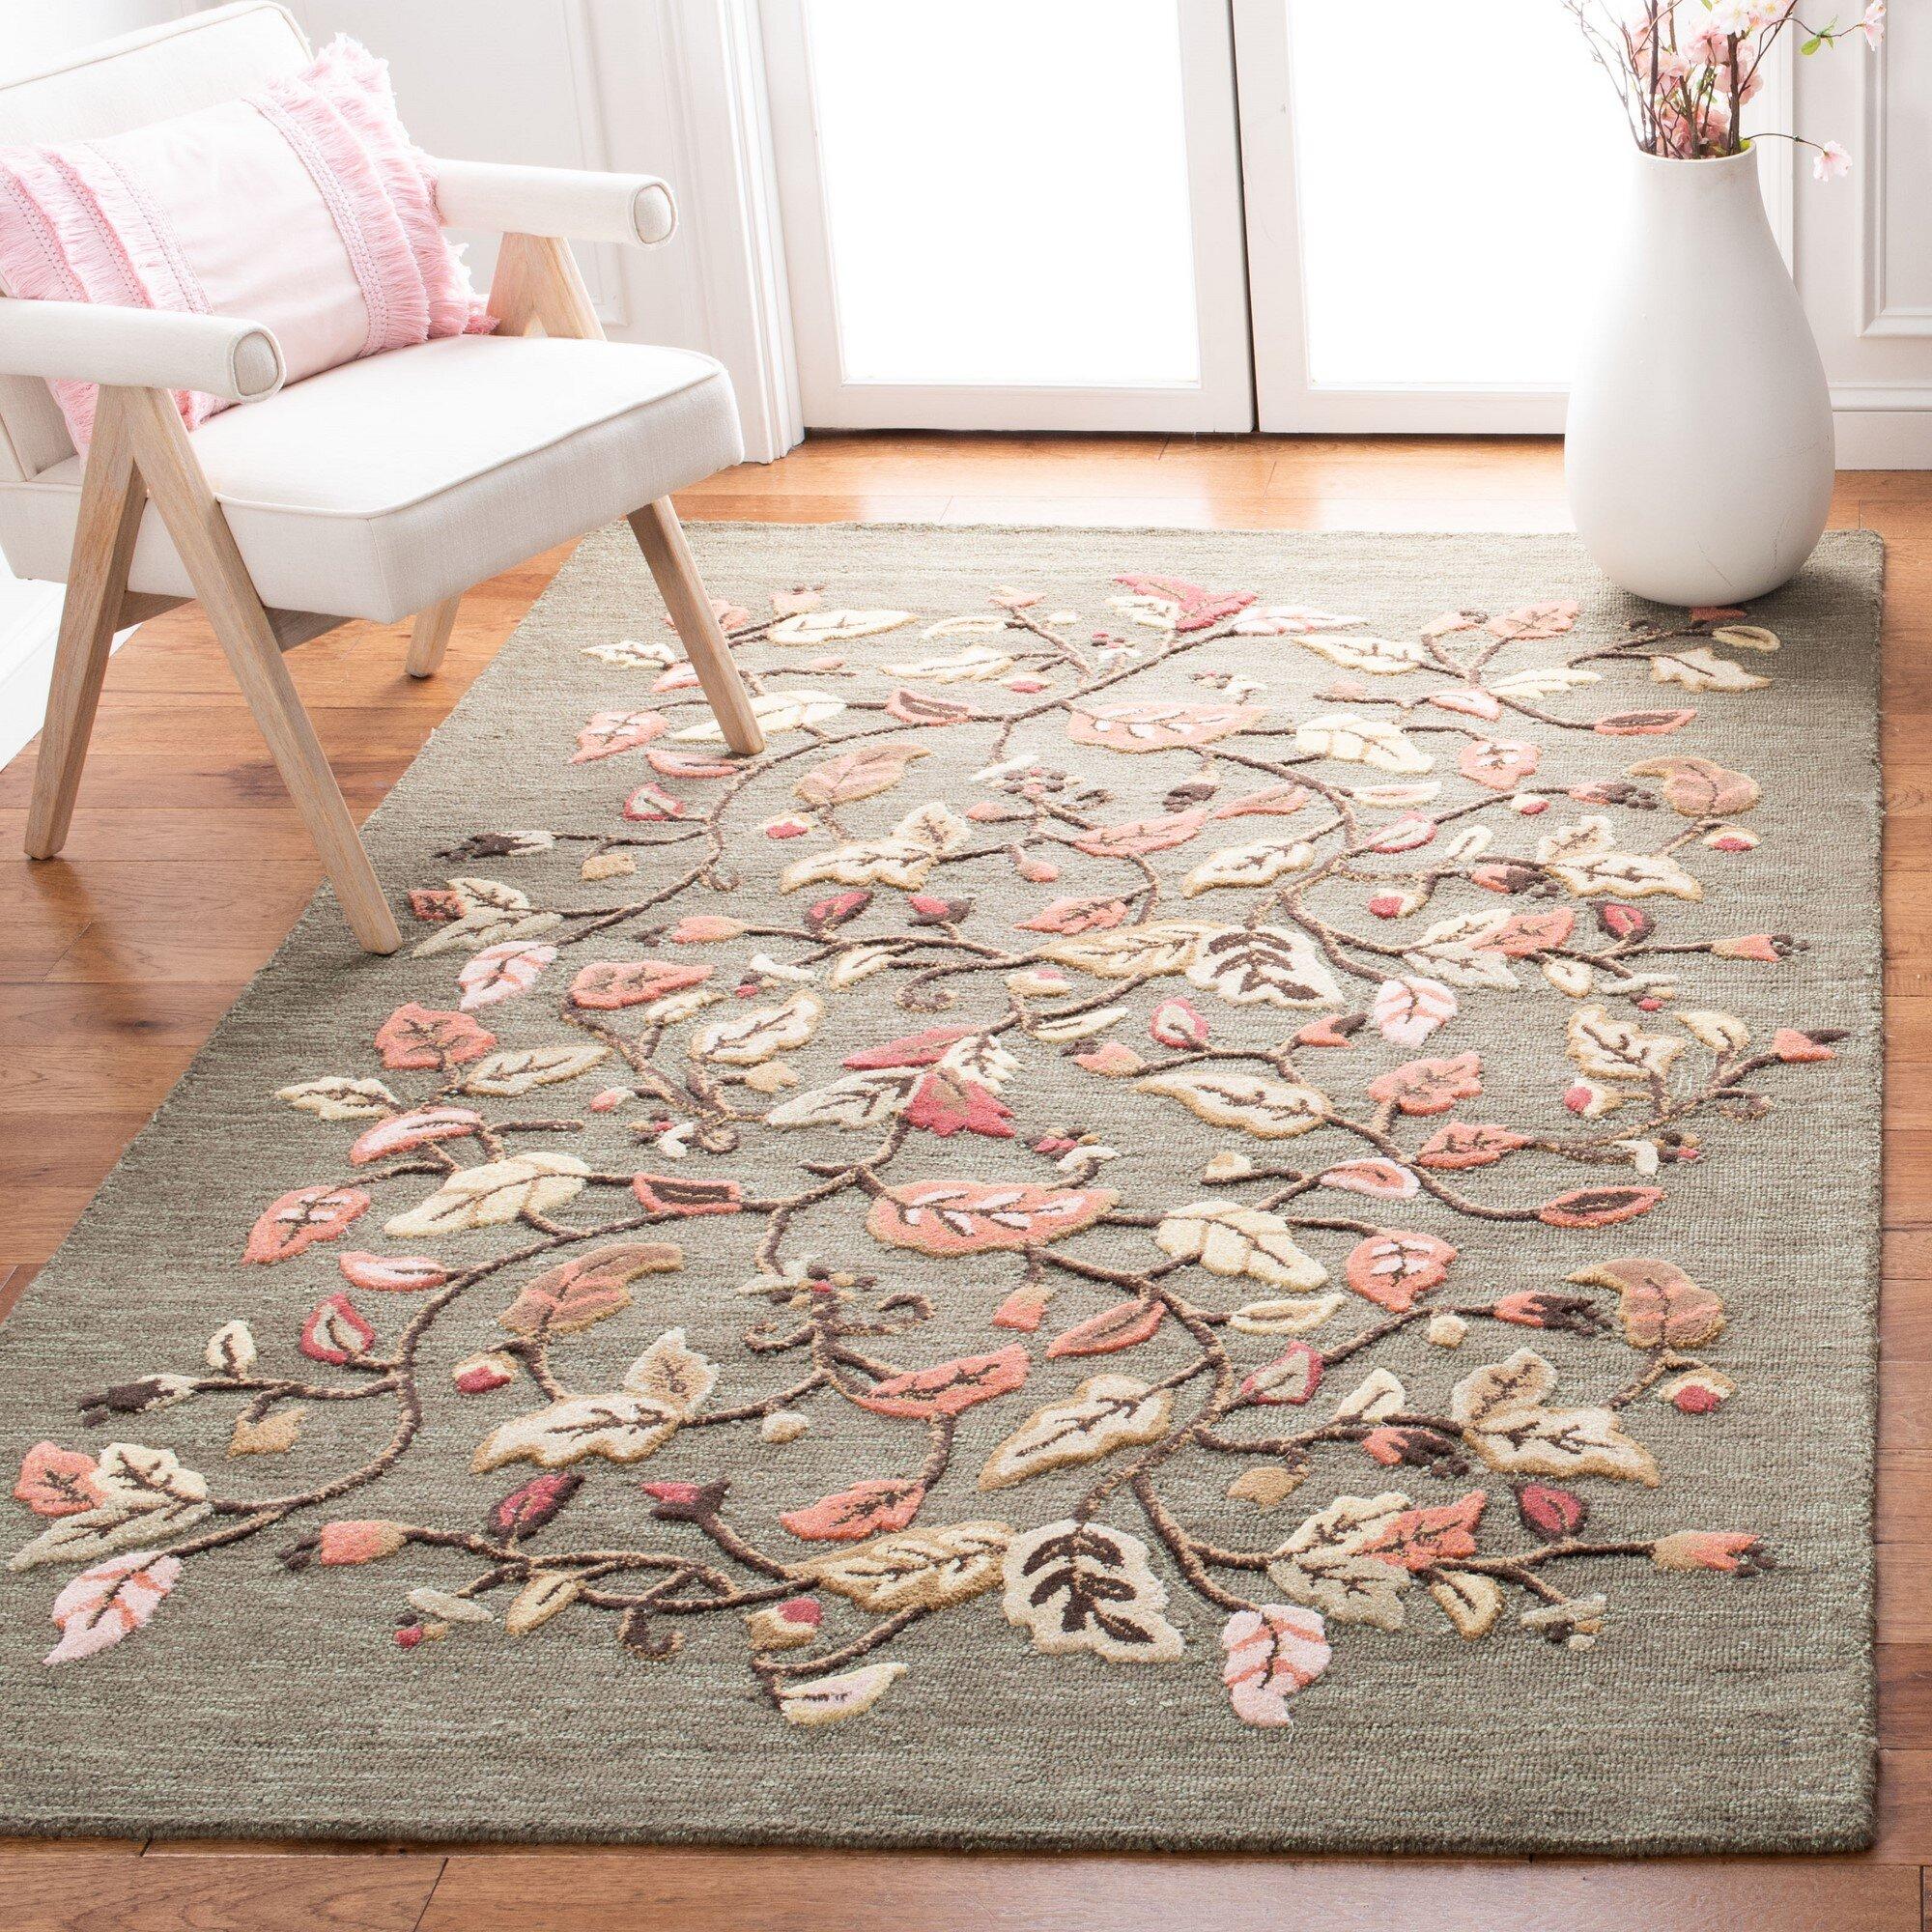 Martha Stewart Rugs Floral Hand Tufted Wool Brown Red Green Area Rug Reviews Wayfair